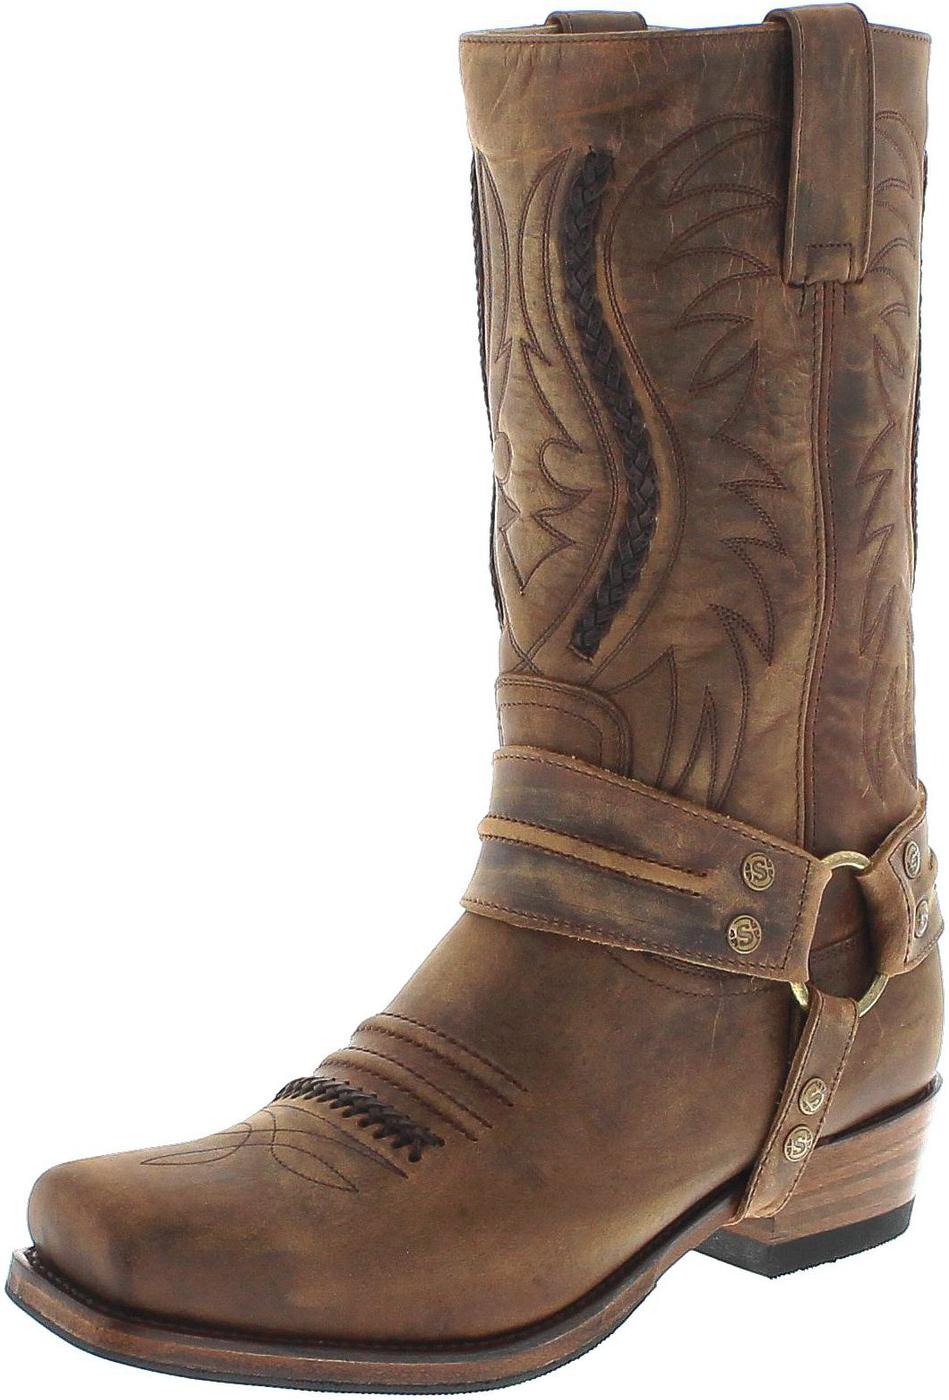 Sendra Boots 12209 Mad Dog Tang Lavado Bikerstiefel - braun